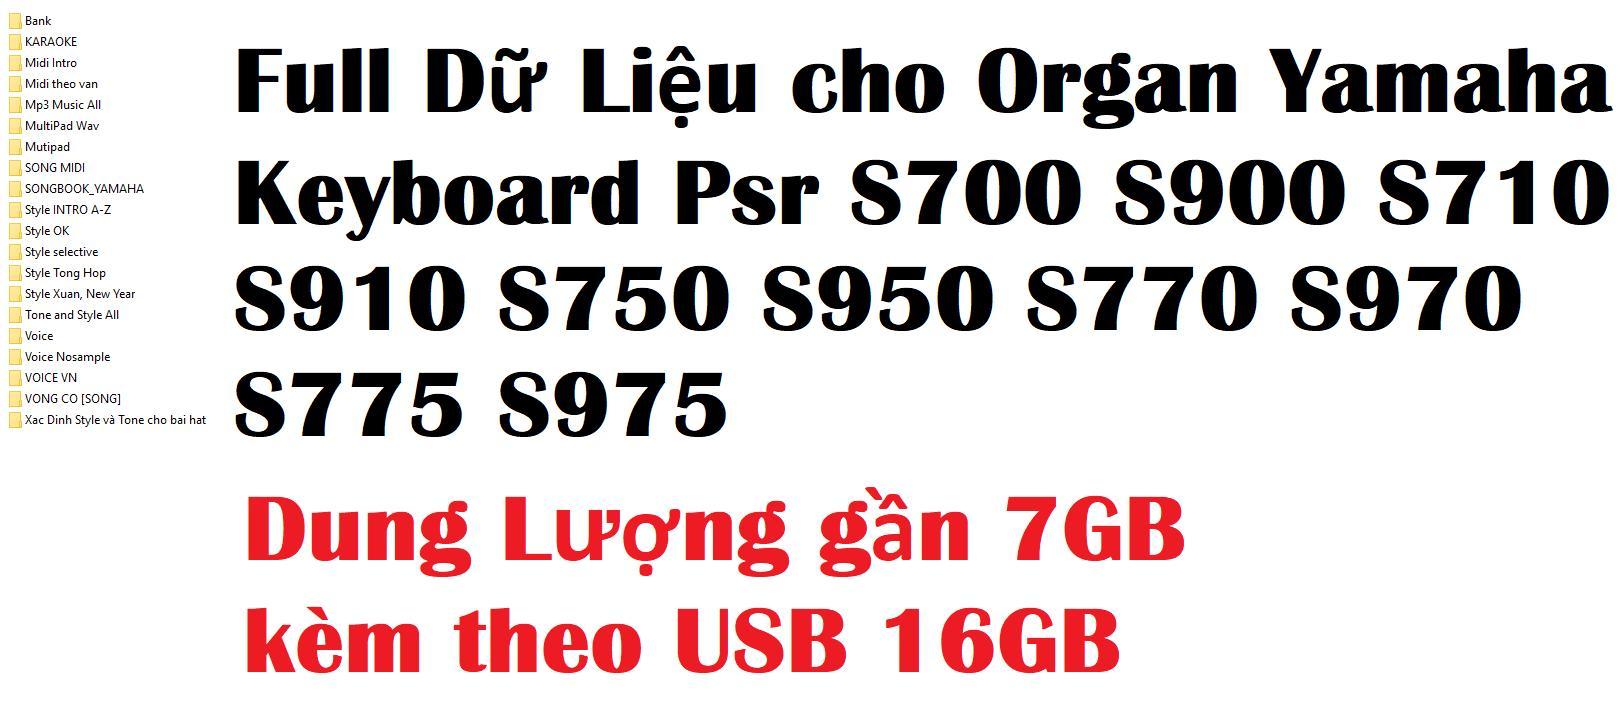 Style, Midi, Song Book, Karaoke, Bank, Voice Cho Organ Yamaha Keyboard S670 S700 S900 S710 S910 S750 S950 S770 S970 S775 S975 Đang Ưu Đãi Giá